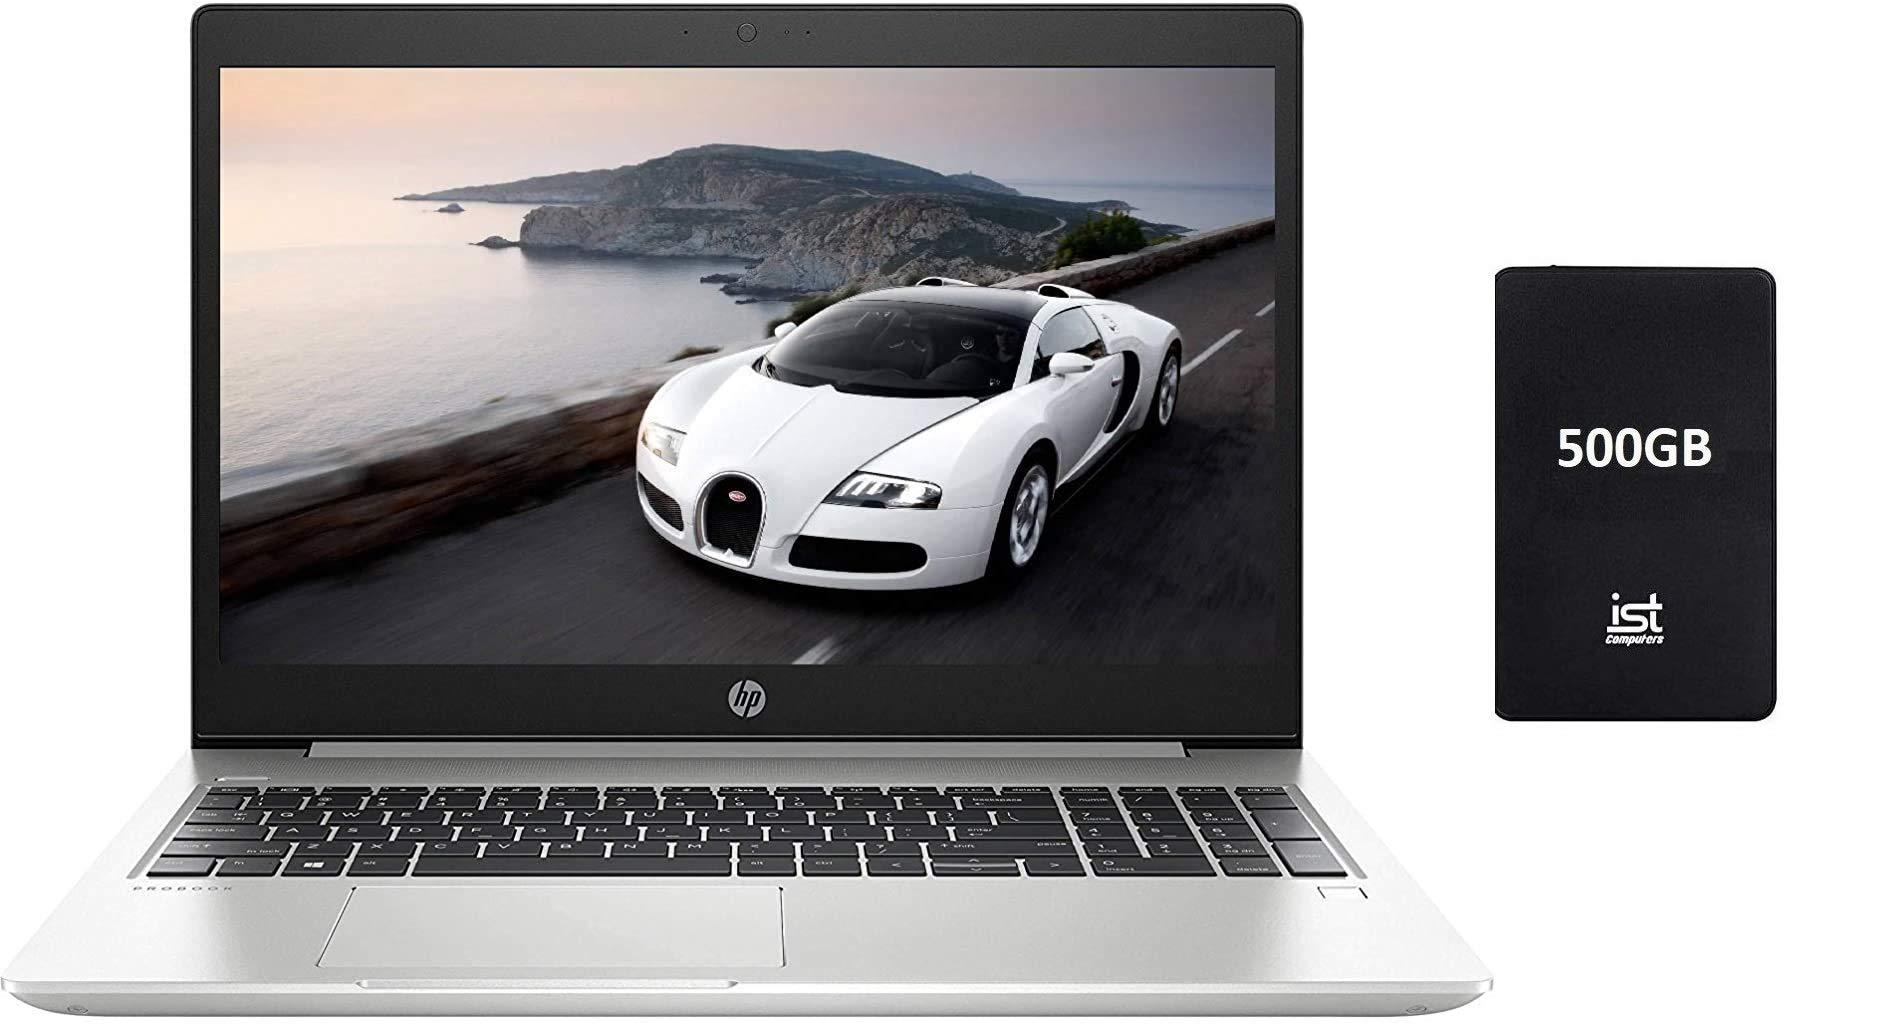 "2019 HP Probook 450 G6 15.6"" HD Business Laptop (Intel Quad-Core i5-8265U, 16GB DDR4 RAM, 256GB PCIe NVMe M.2 SSD + 1TB HDD, UHD 620) Backlit, USB Type-C, RJ45, HDMI, Windows 10 Pro Professional"